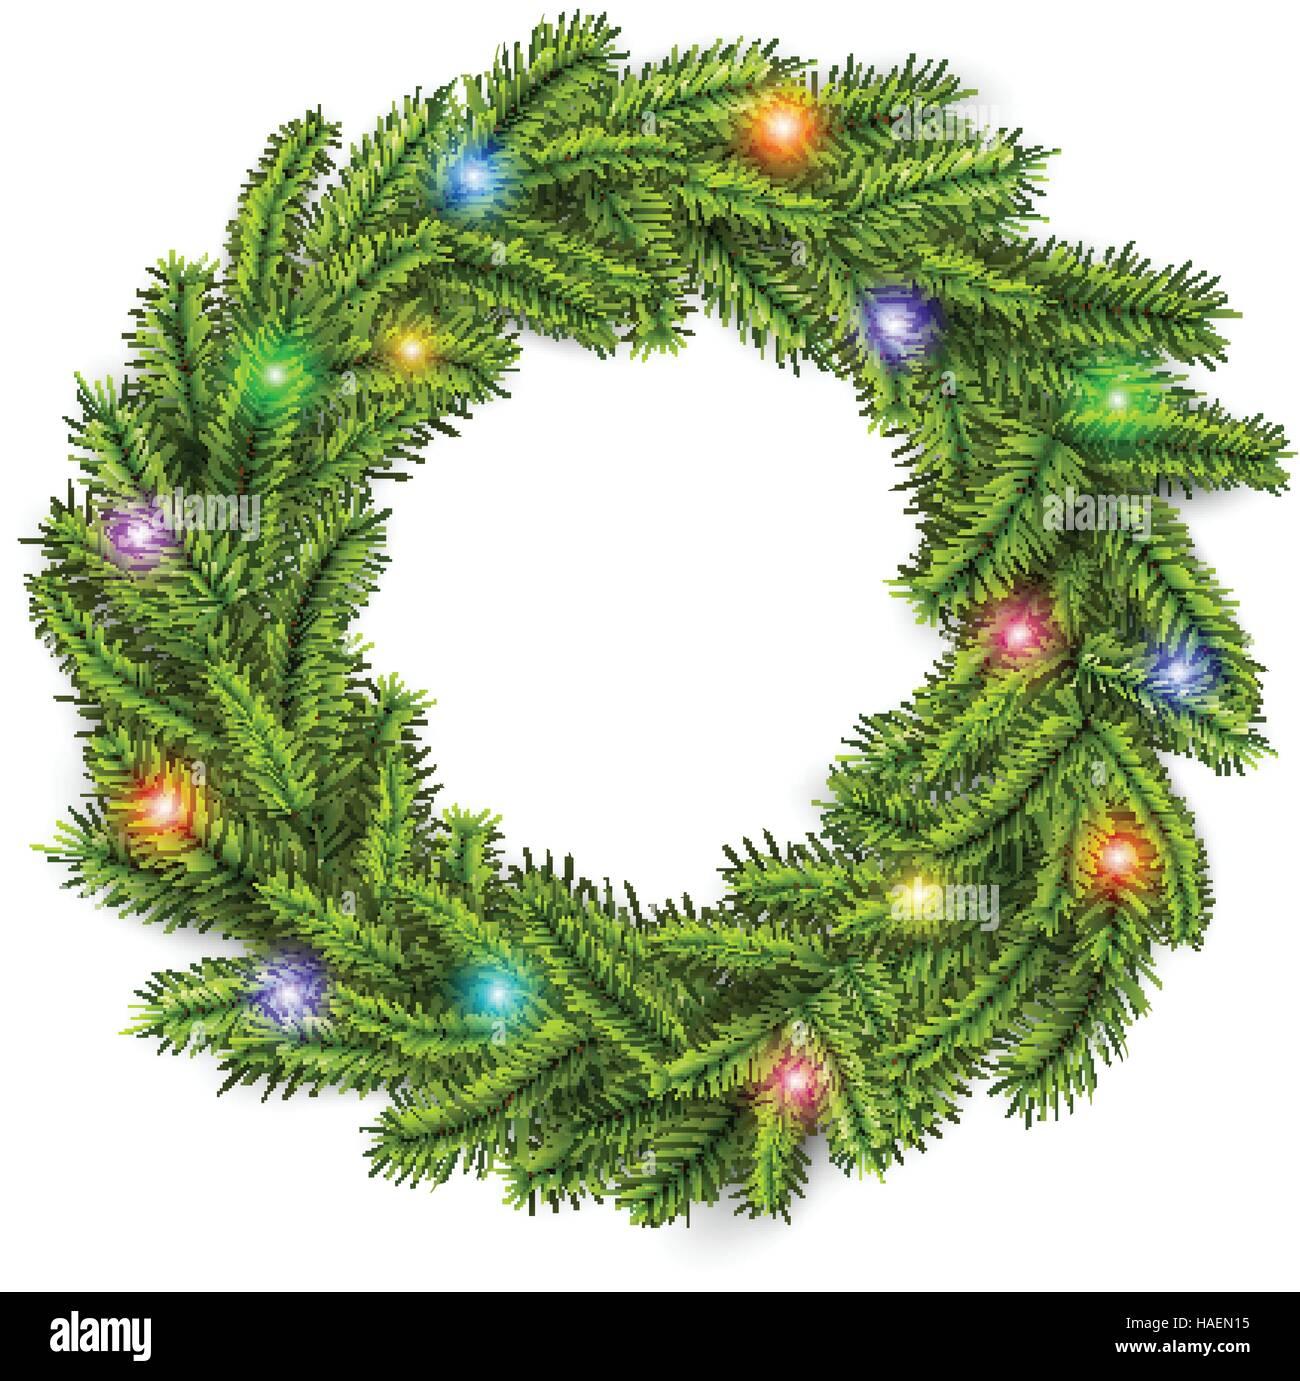 Christmas Lights Stock Vector Images - Alamy